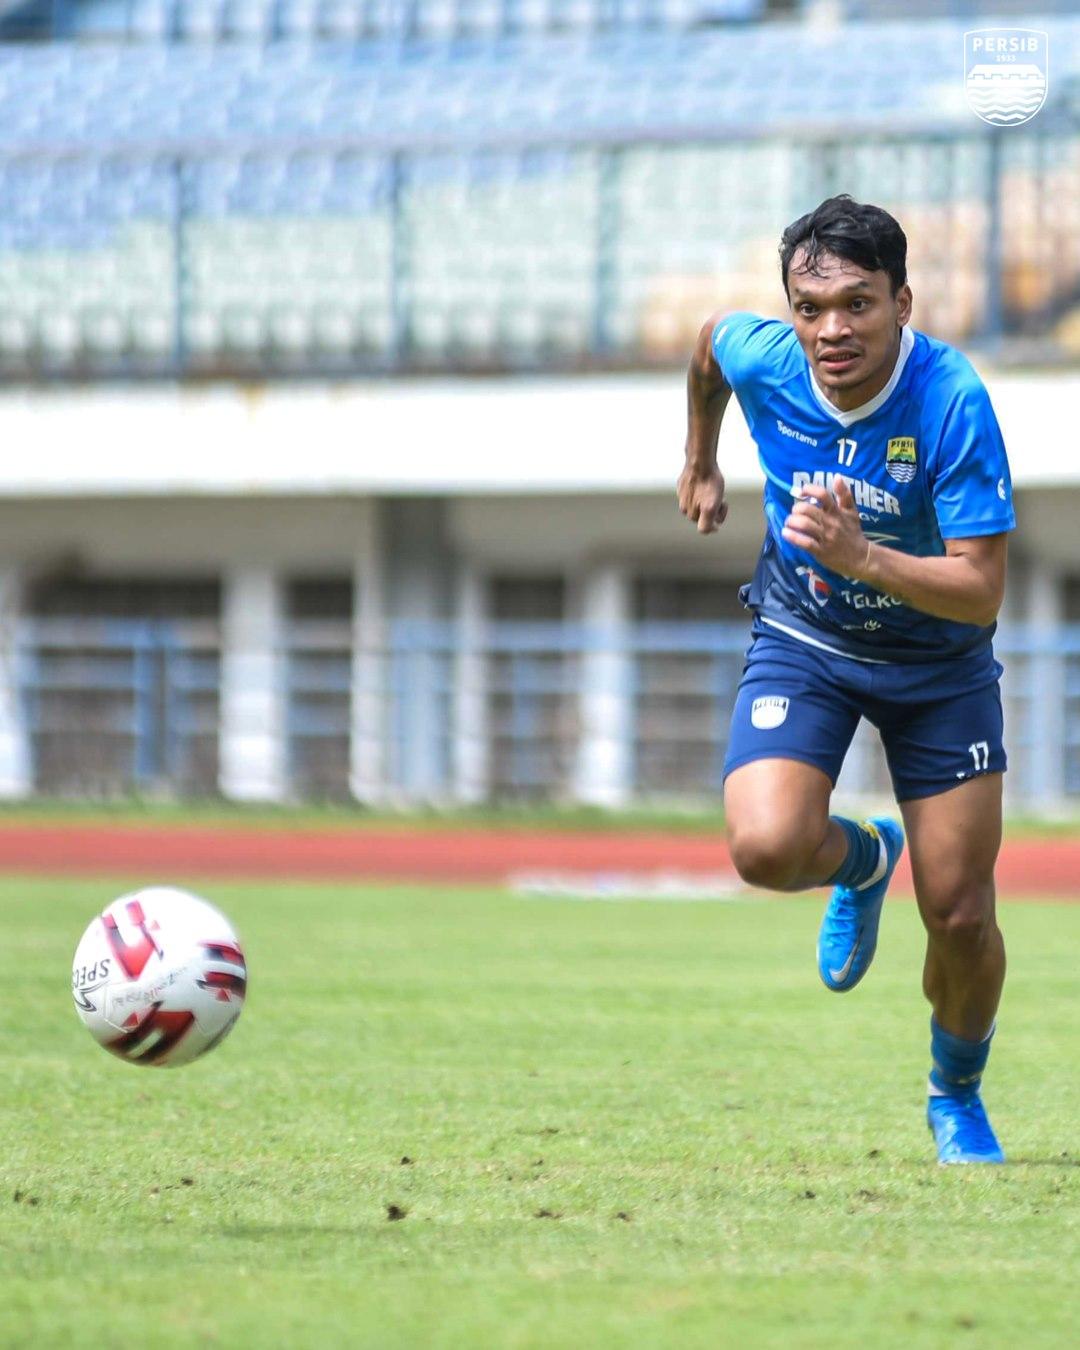 Latihan Pertama Ferdinand Sinaga Bersama Tim | 11 Maret 2021